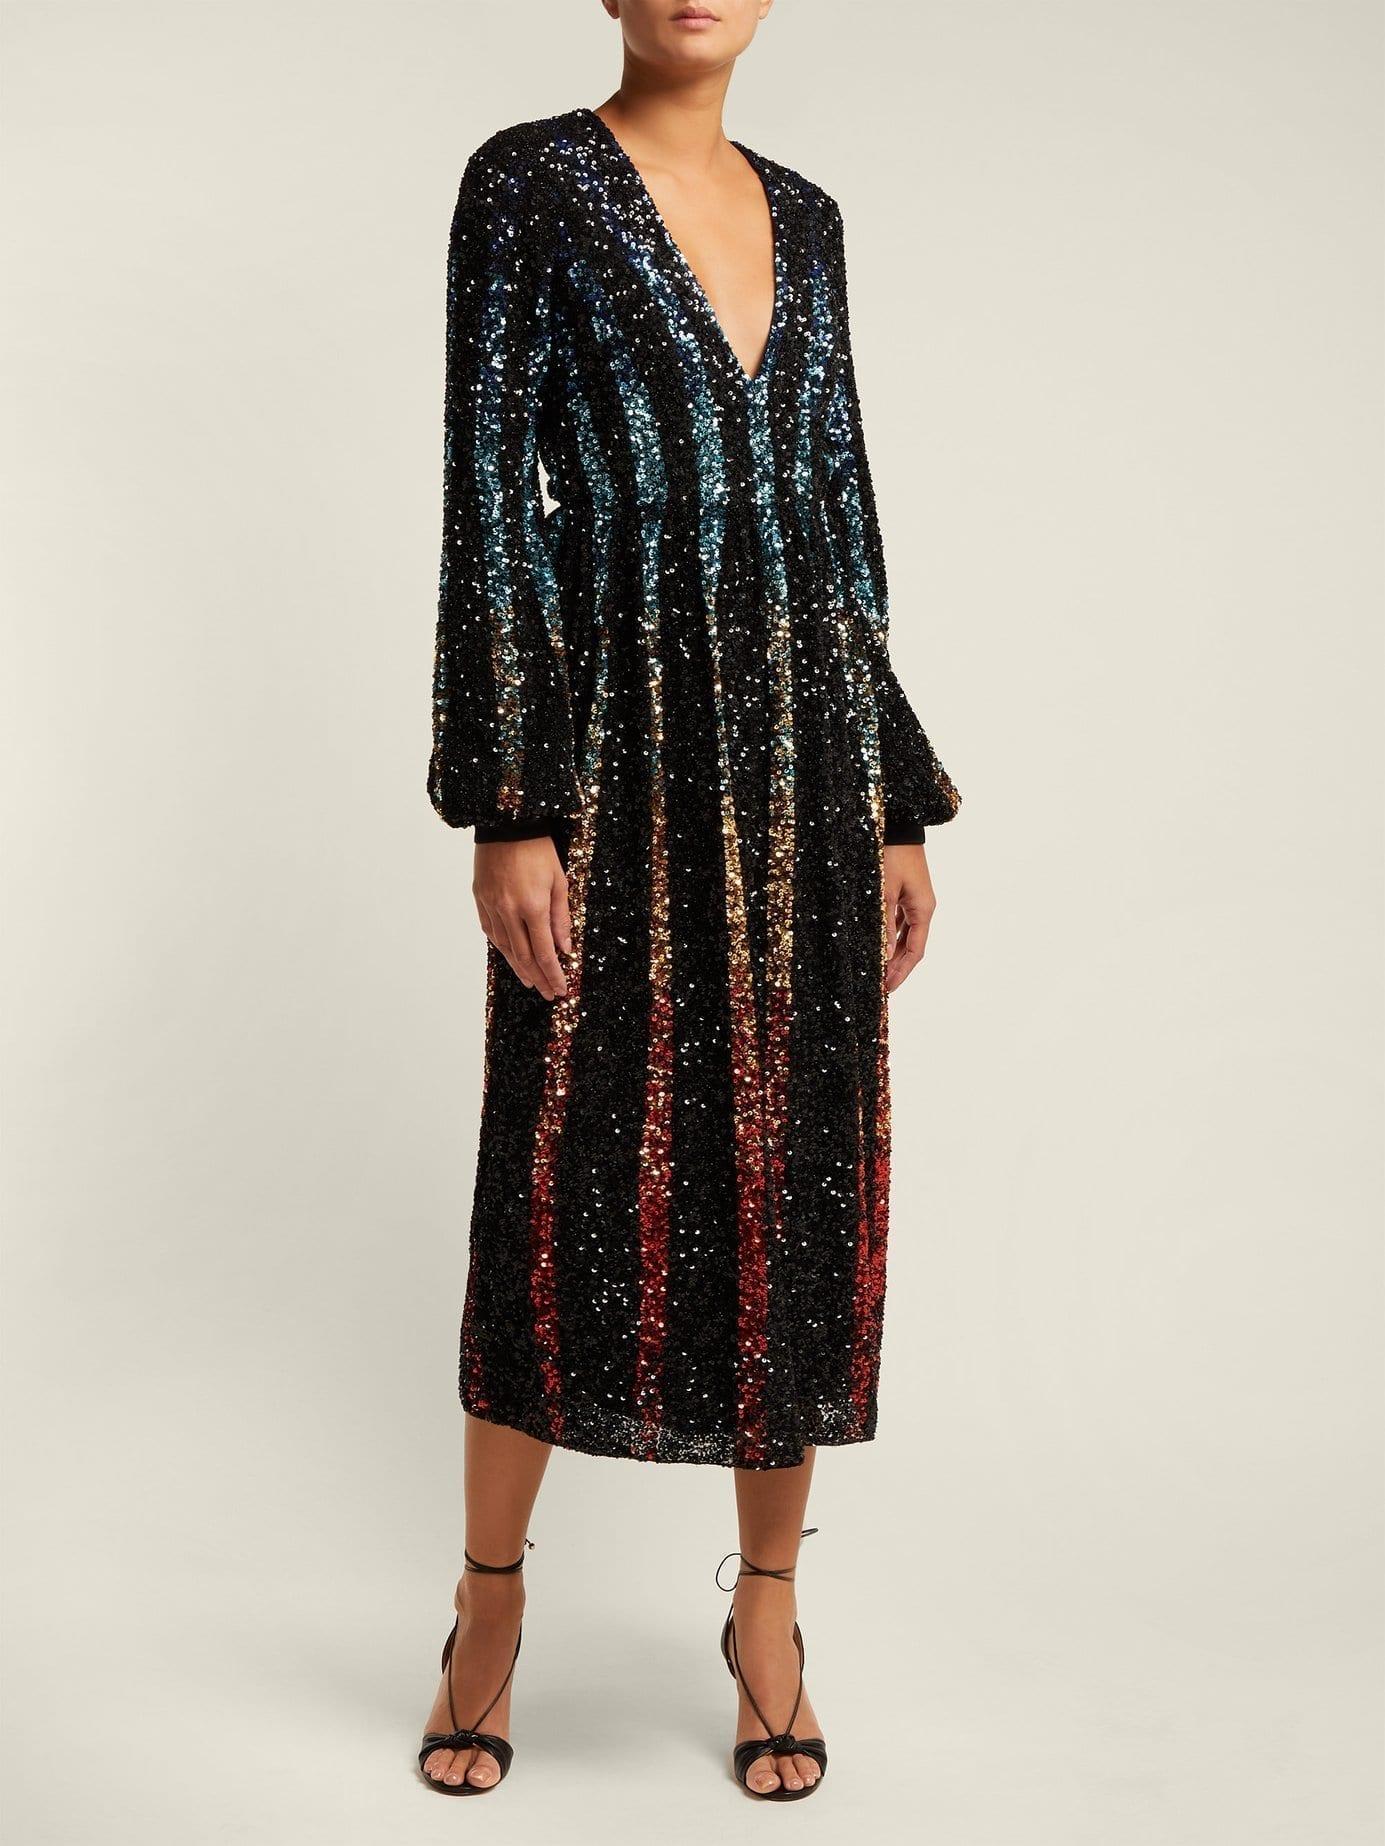 SALONI Camille Gradient Sequinned Black Dress